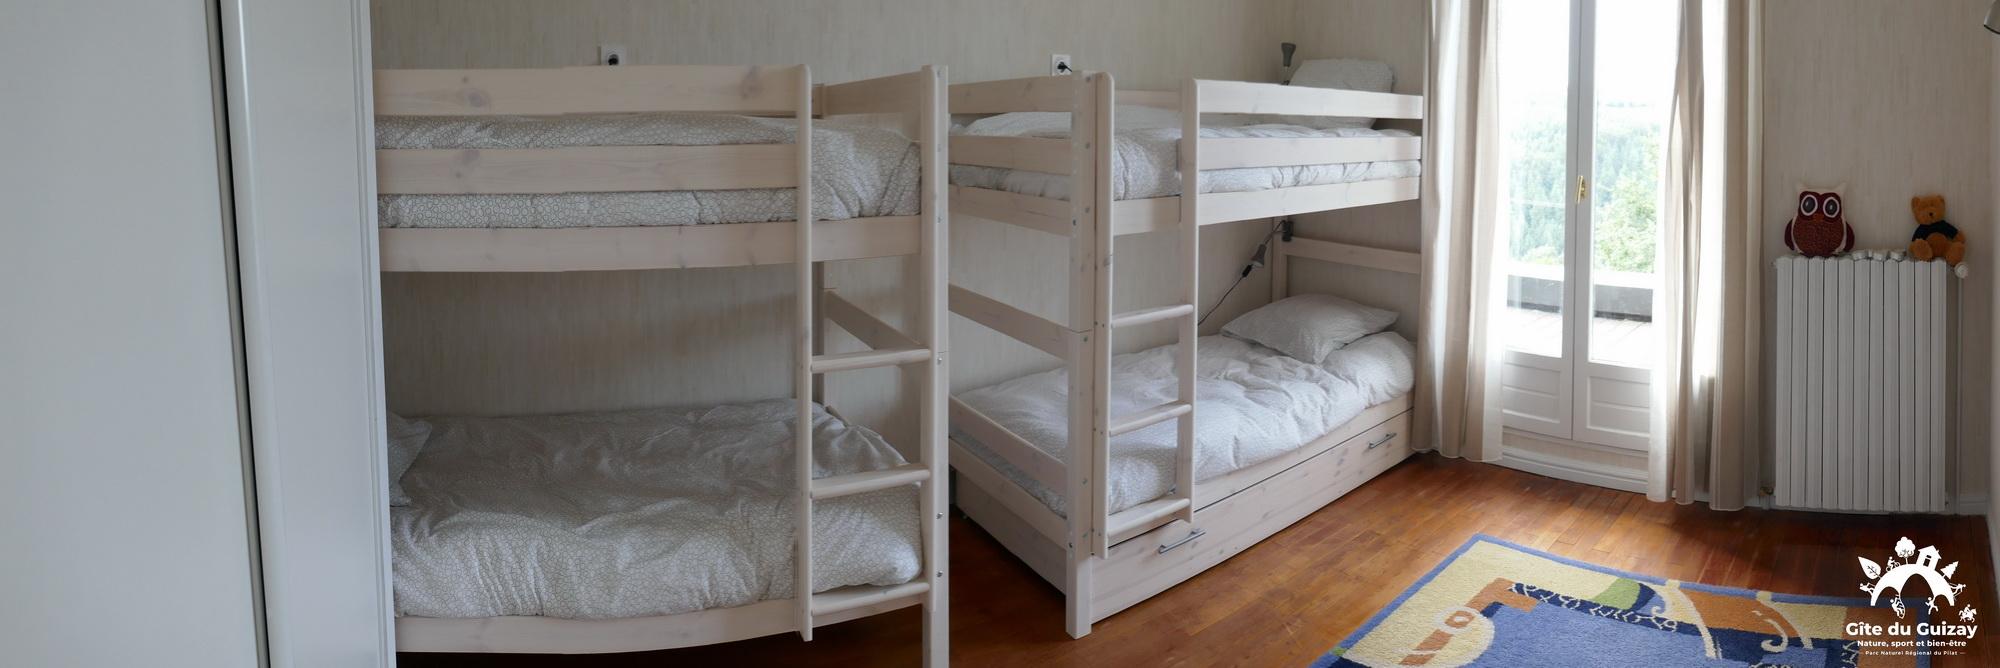 gite du guizay chambre 4 lits